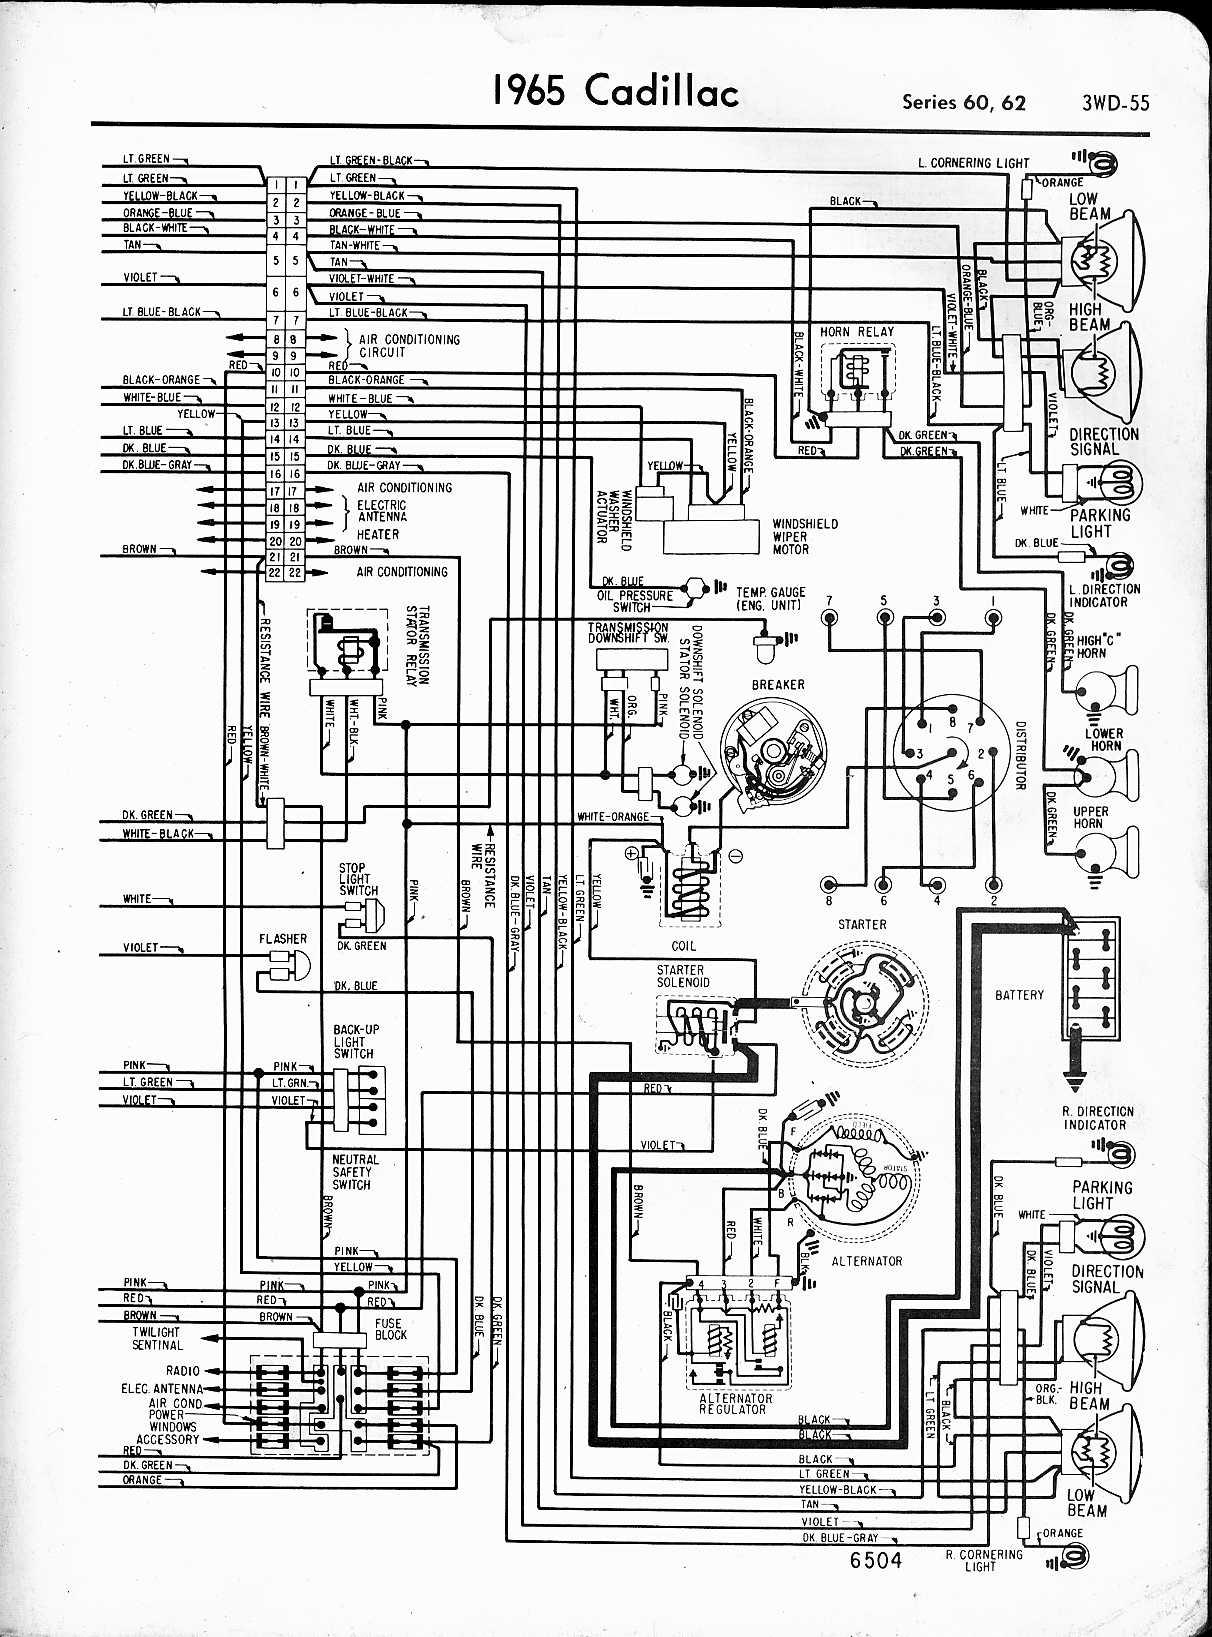 DW_5077] 2000 Cadillac Seville Sls Engine Diagram Schematic WiringStrai Joami Kweca Norab Gue45 Mohammedshrine Librar Wiring 101